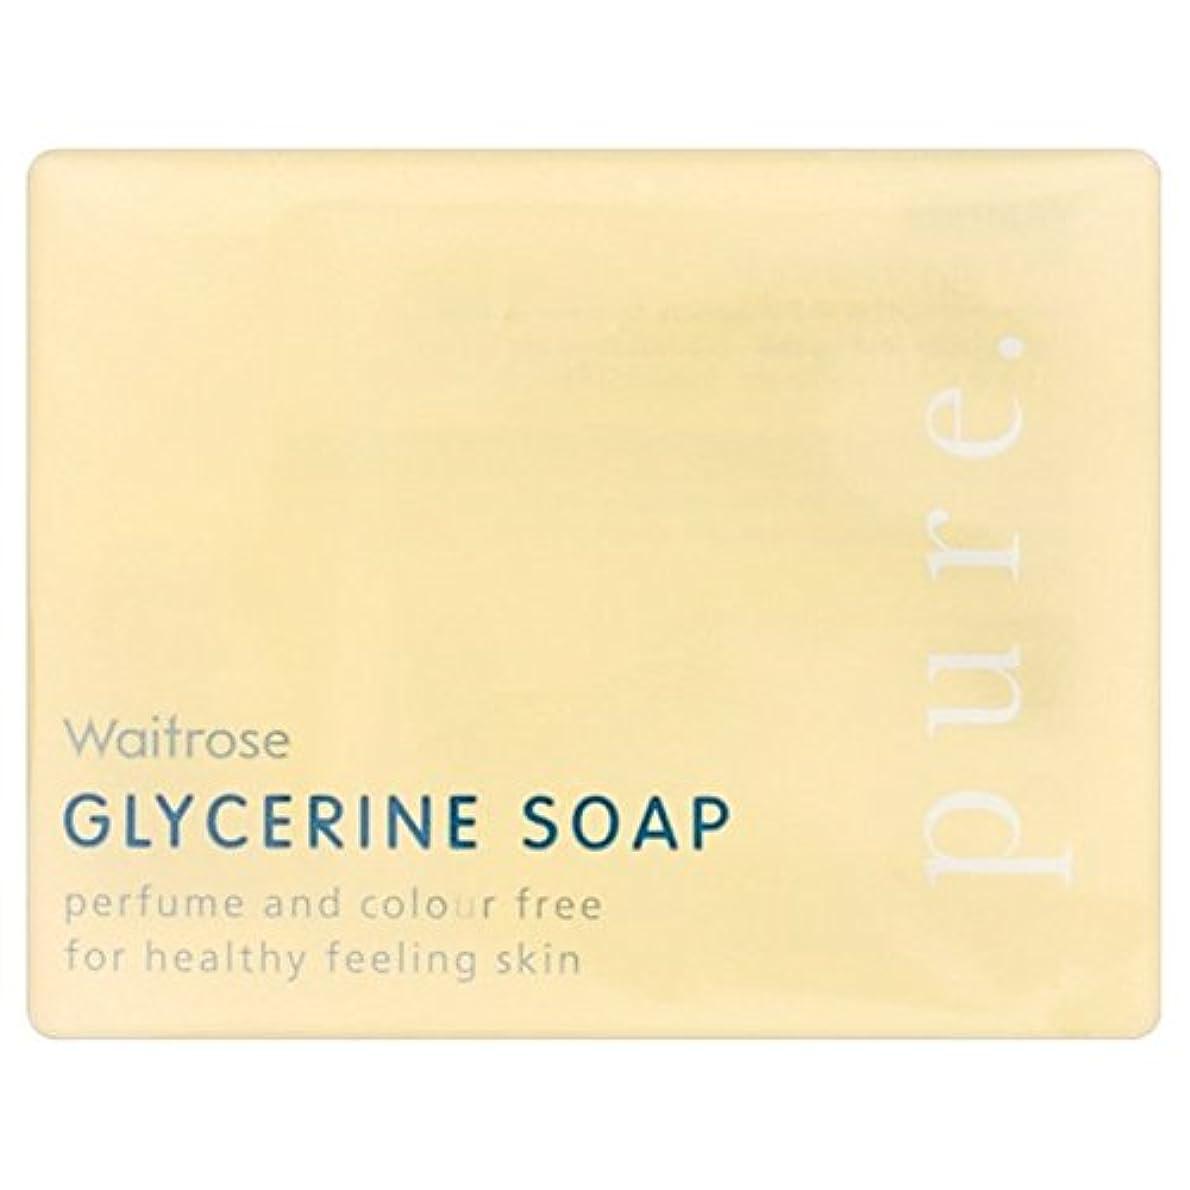 Pure Glycerine Soap Waitrose 100g (Pack of 6) - 純粋なグリセリンソープウェイトローズの100グラム x6 [並行輸入品]